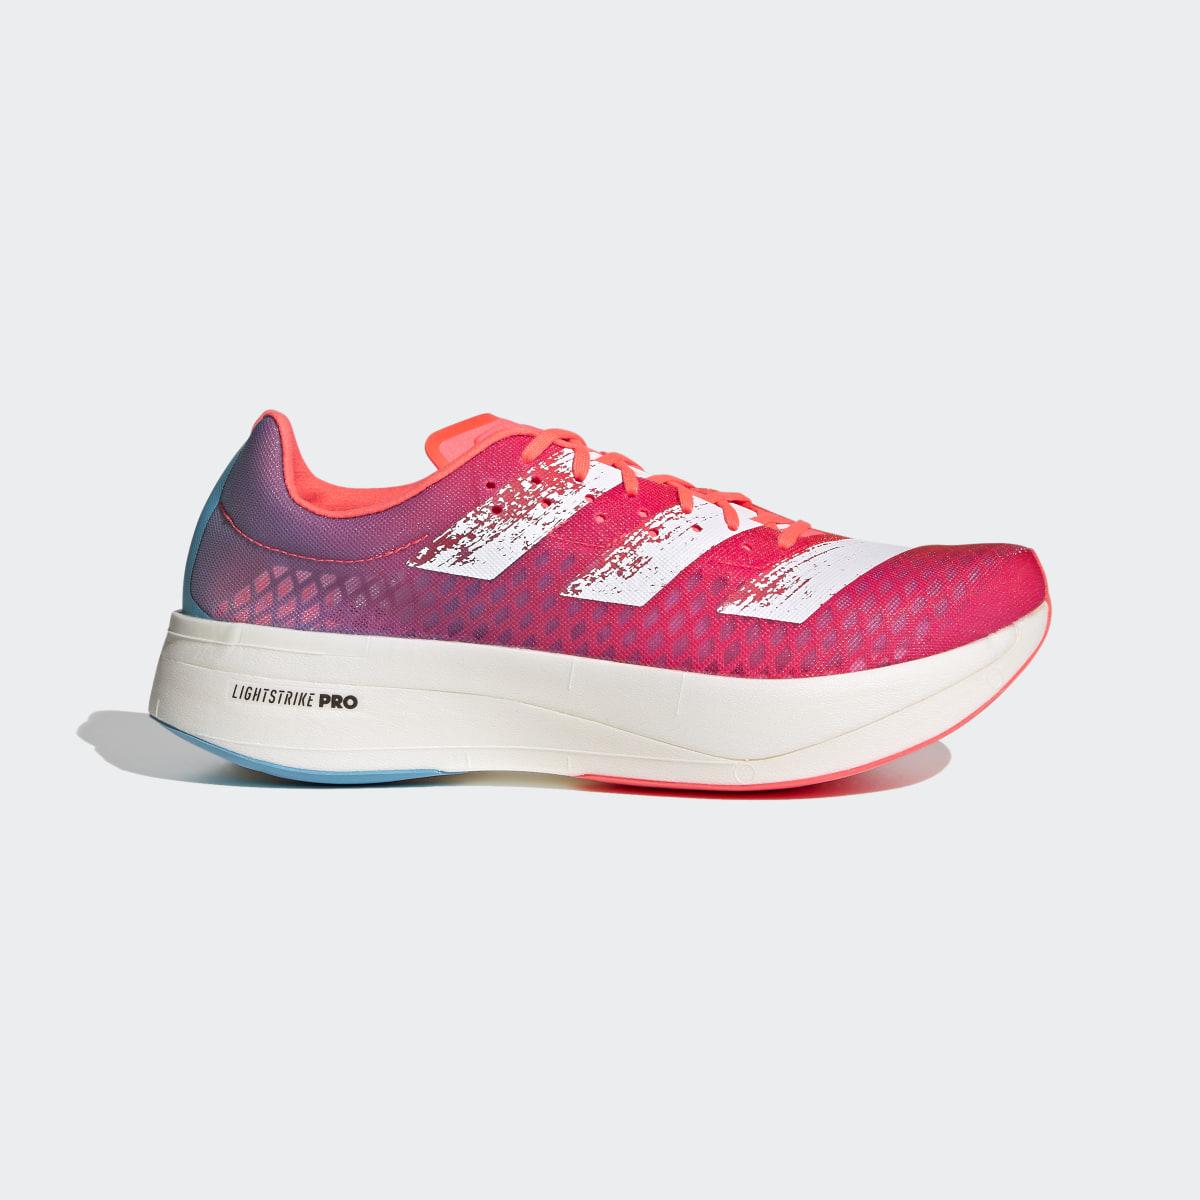 adidas Adizero Adios Pro Running Shoes